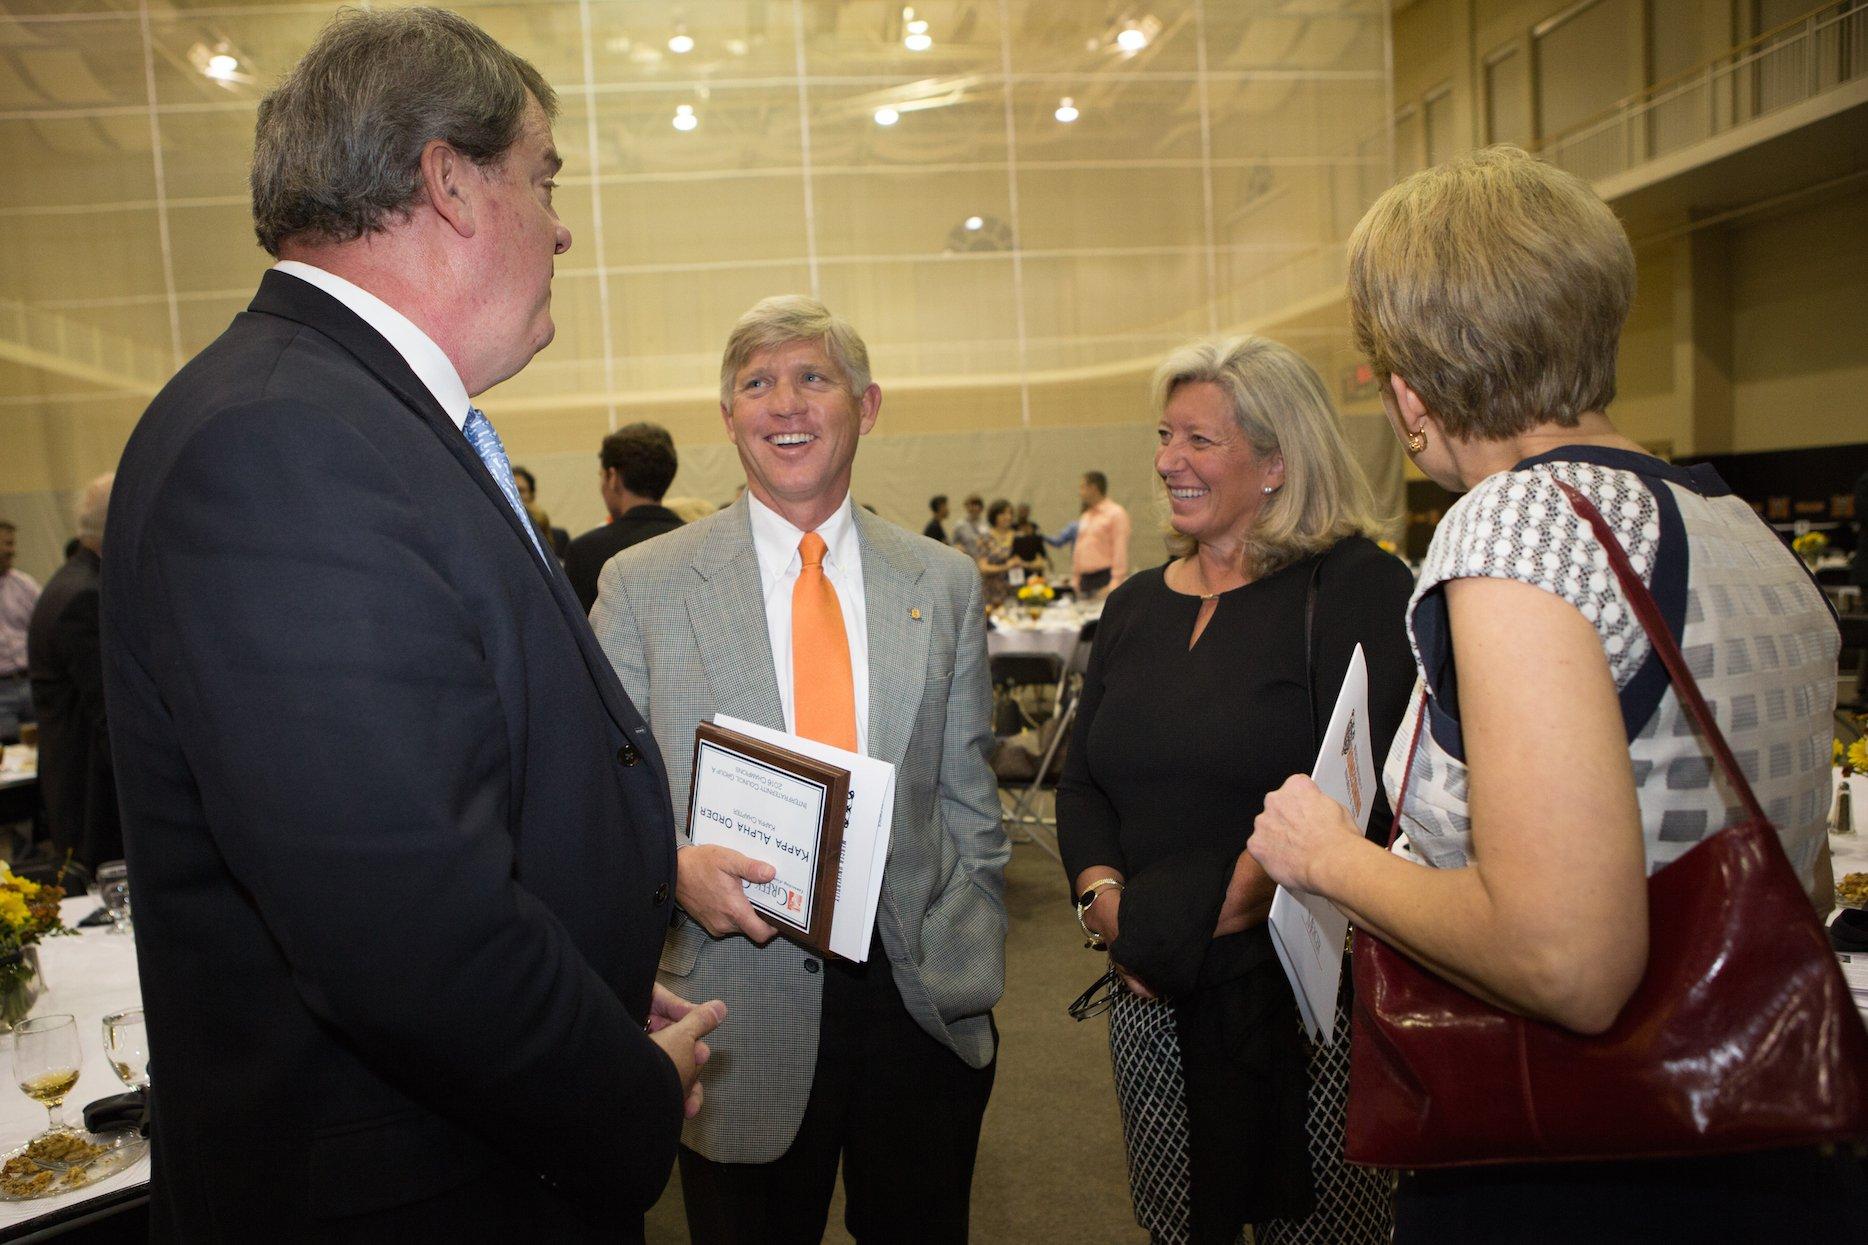 PHOTOS: Alumni Awards Dinner #MercerHC16 https://t.co/Pz5MhX7q0L https://t.co/Ock2P4IKfh